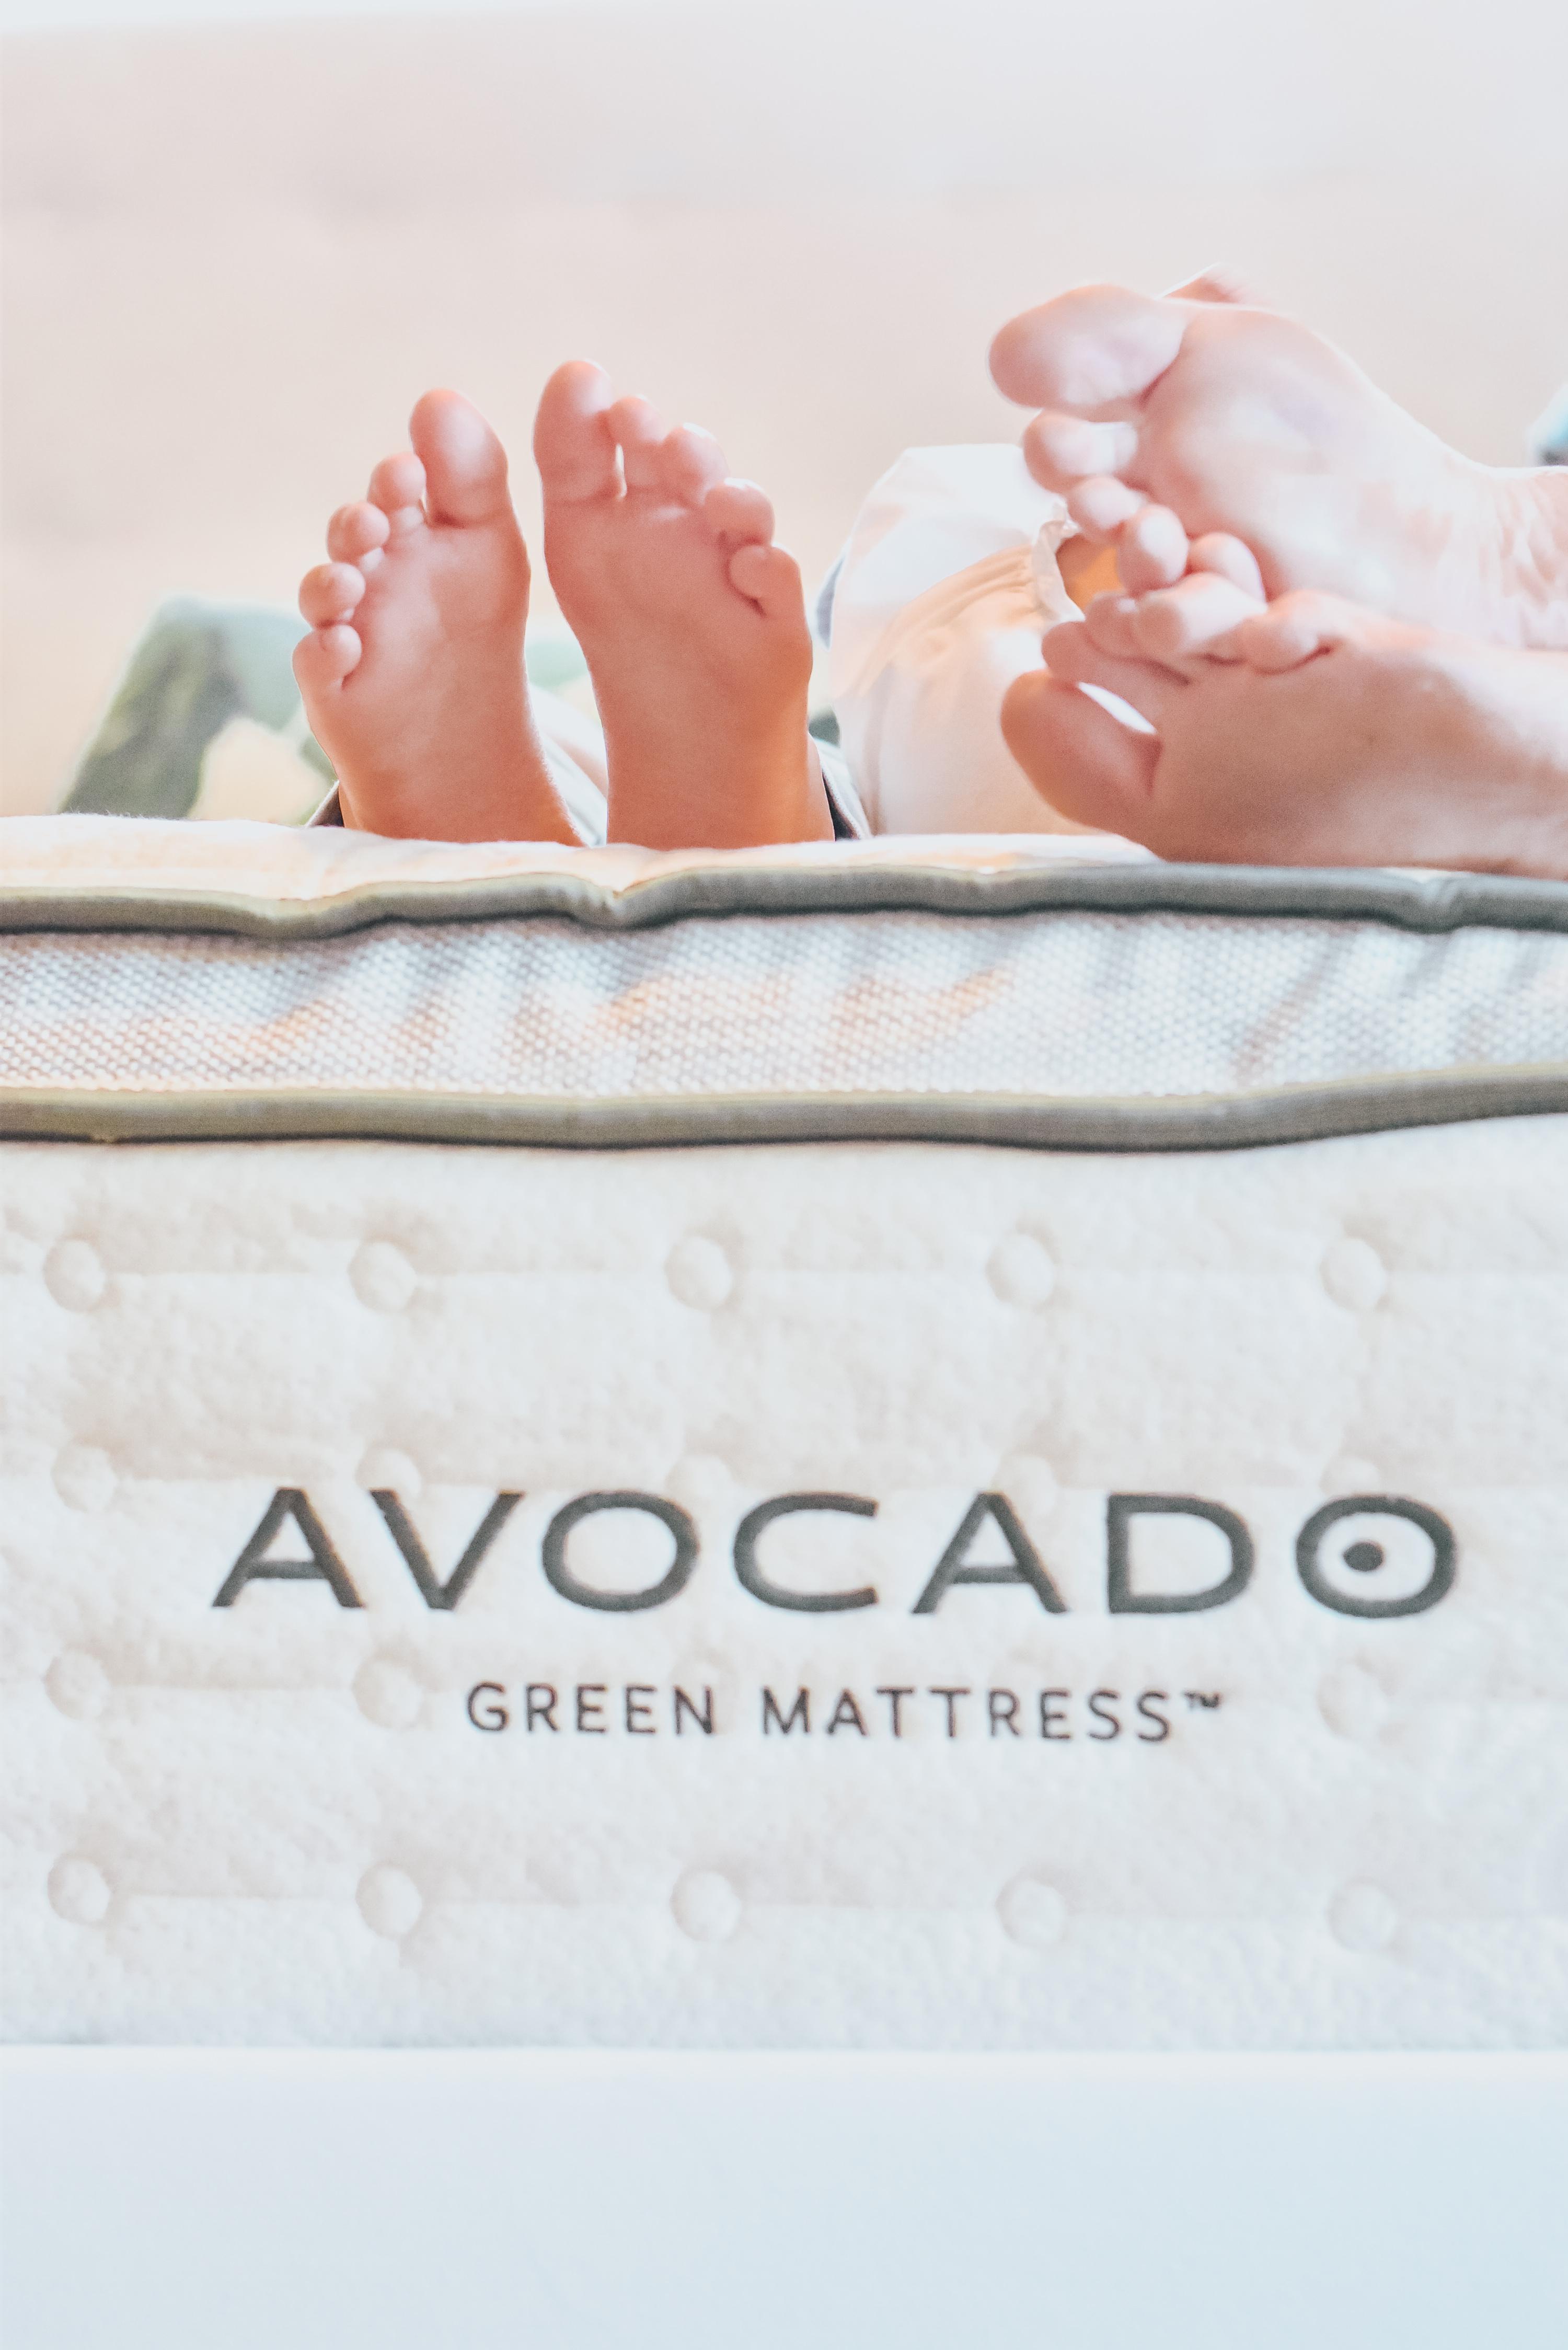 30A Mama - Avocado Mattress Review